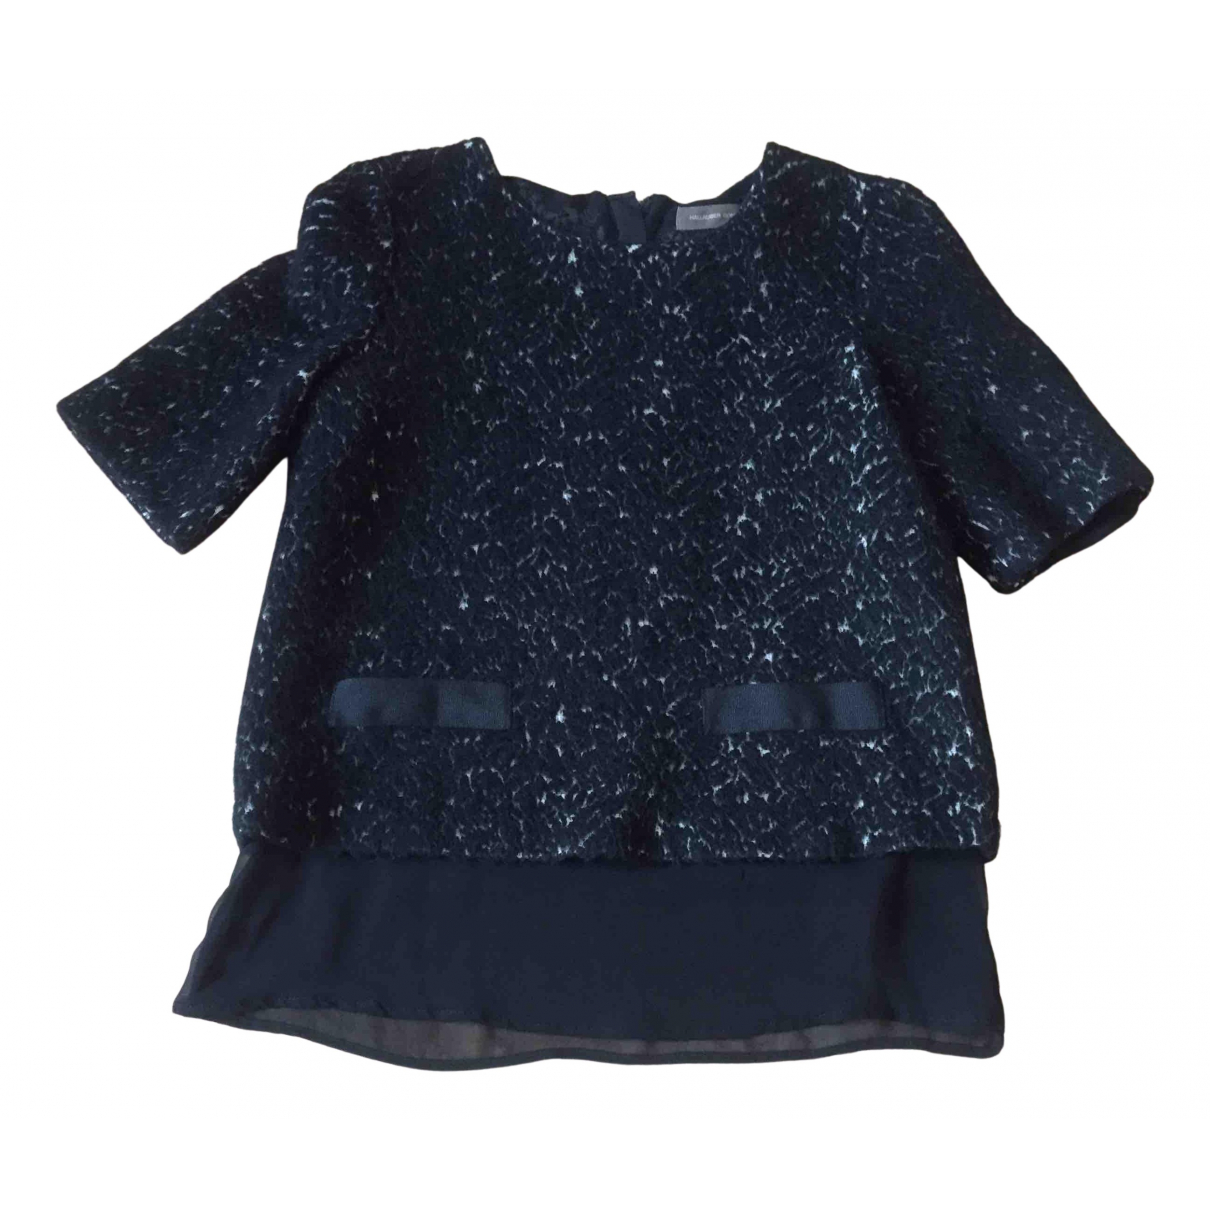 Hallhuber N Black Wool  top for Women 6 UK